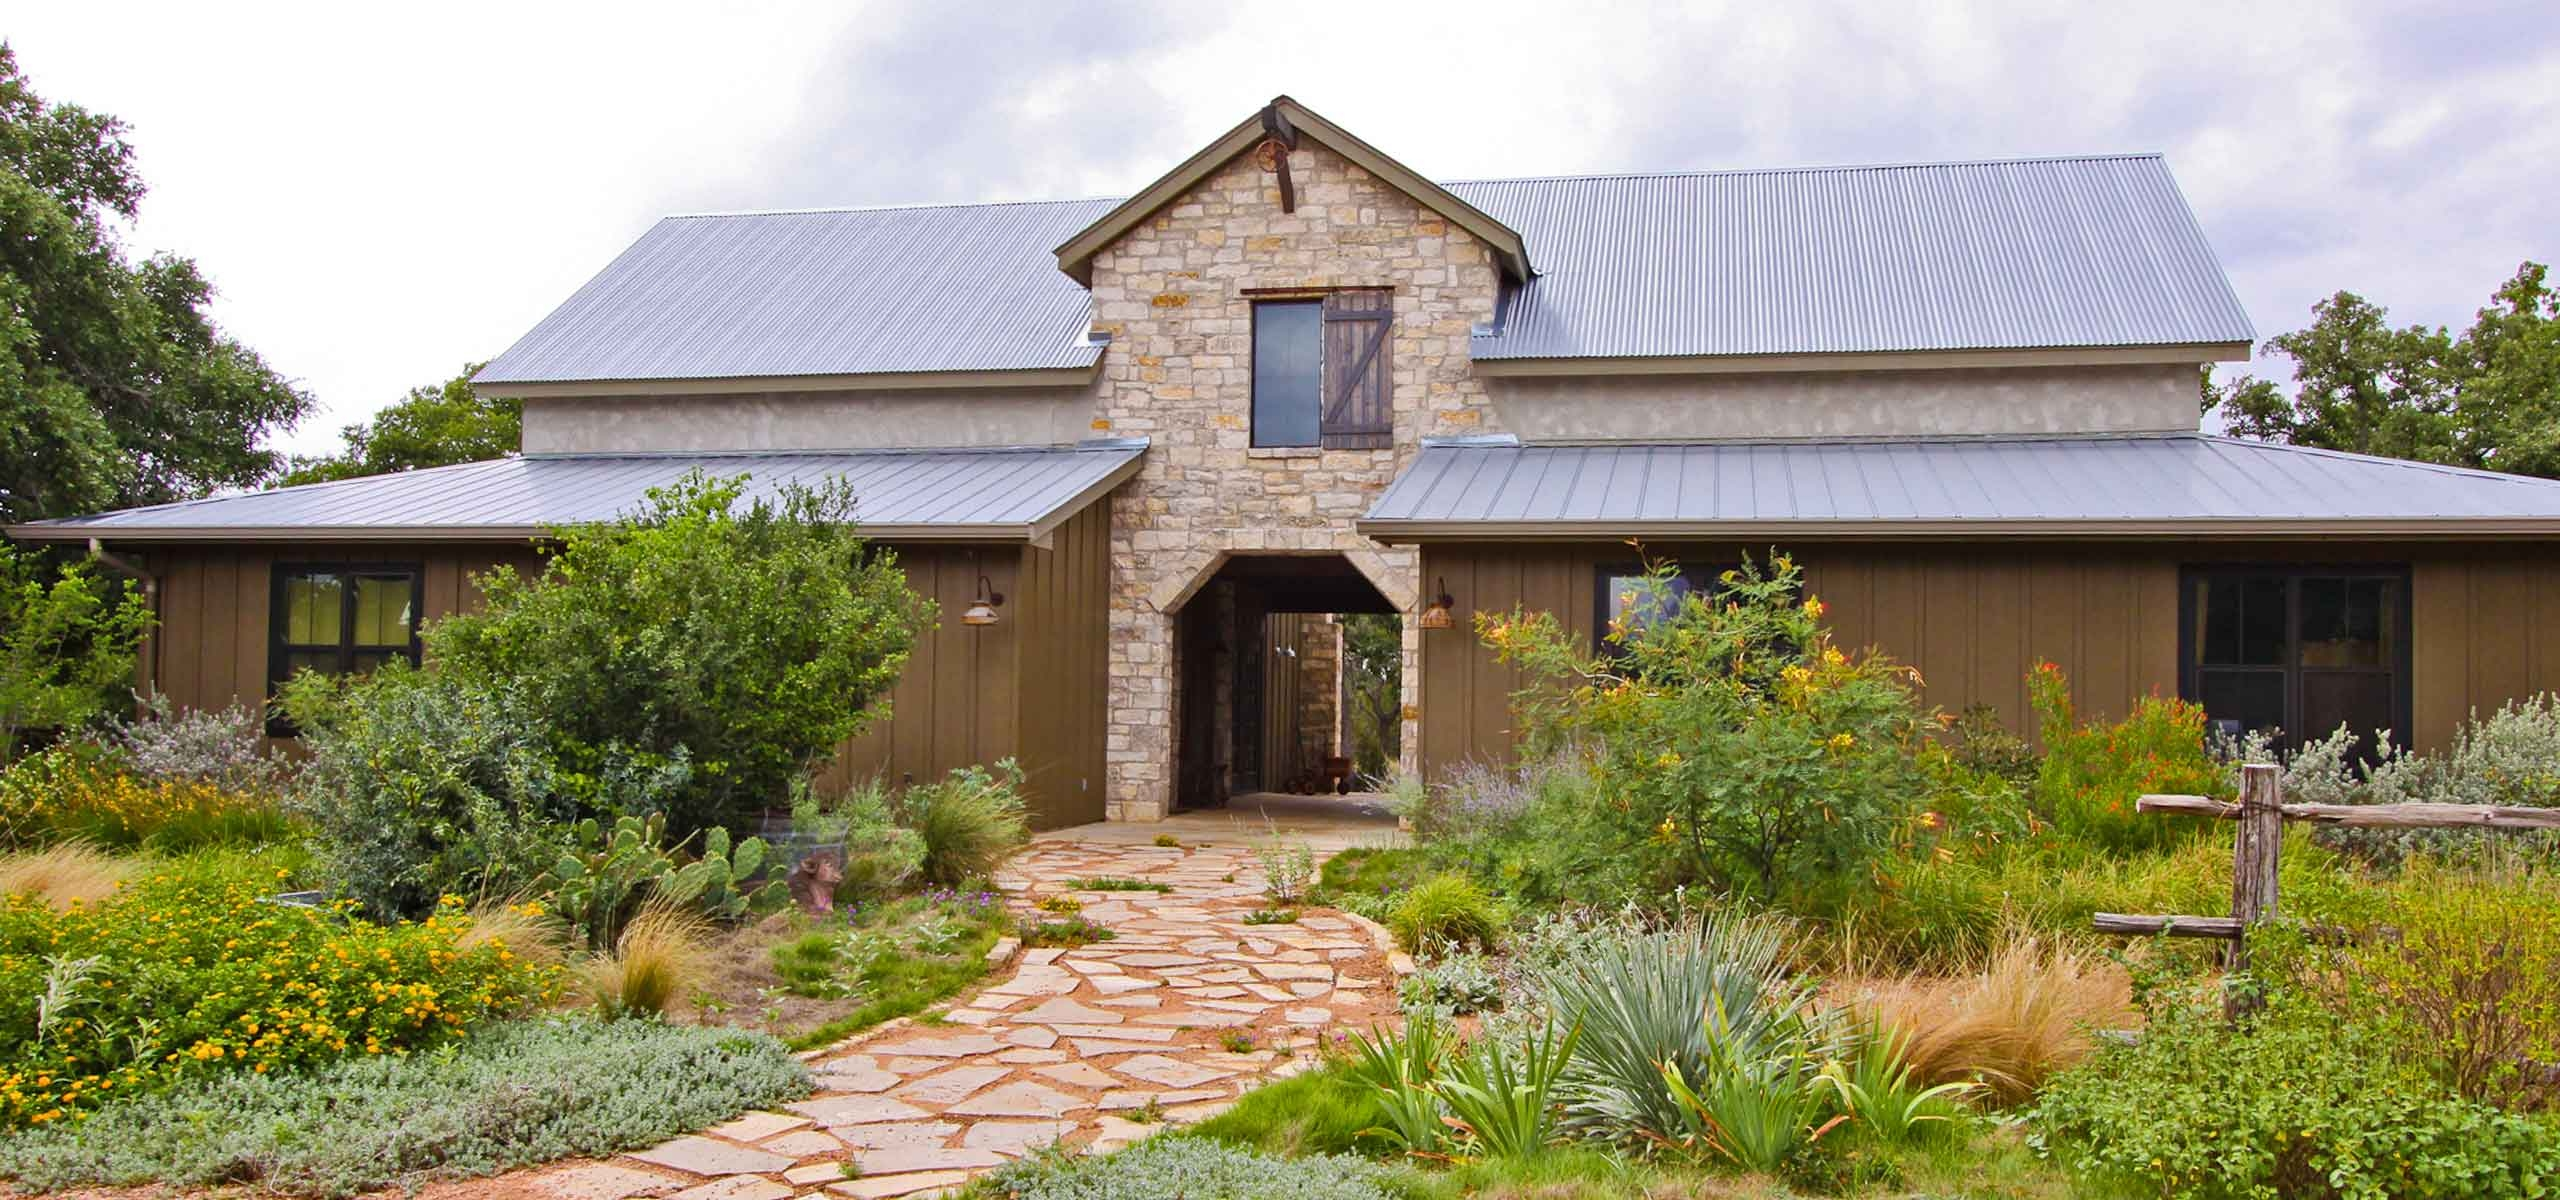 Rustic Texas Home Plans Home  Texas Home Plans